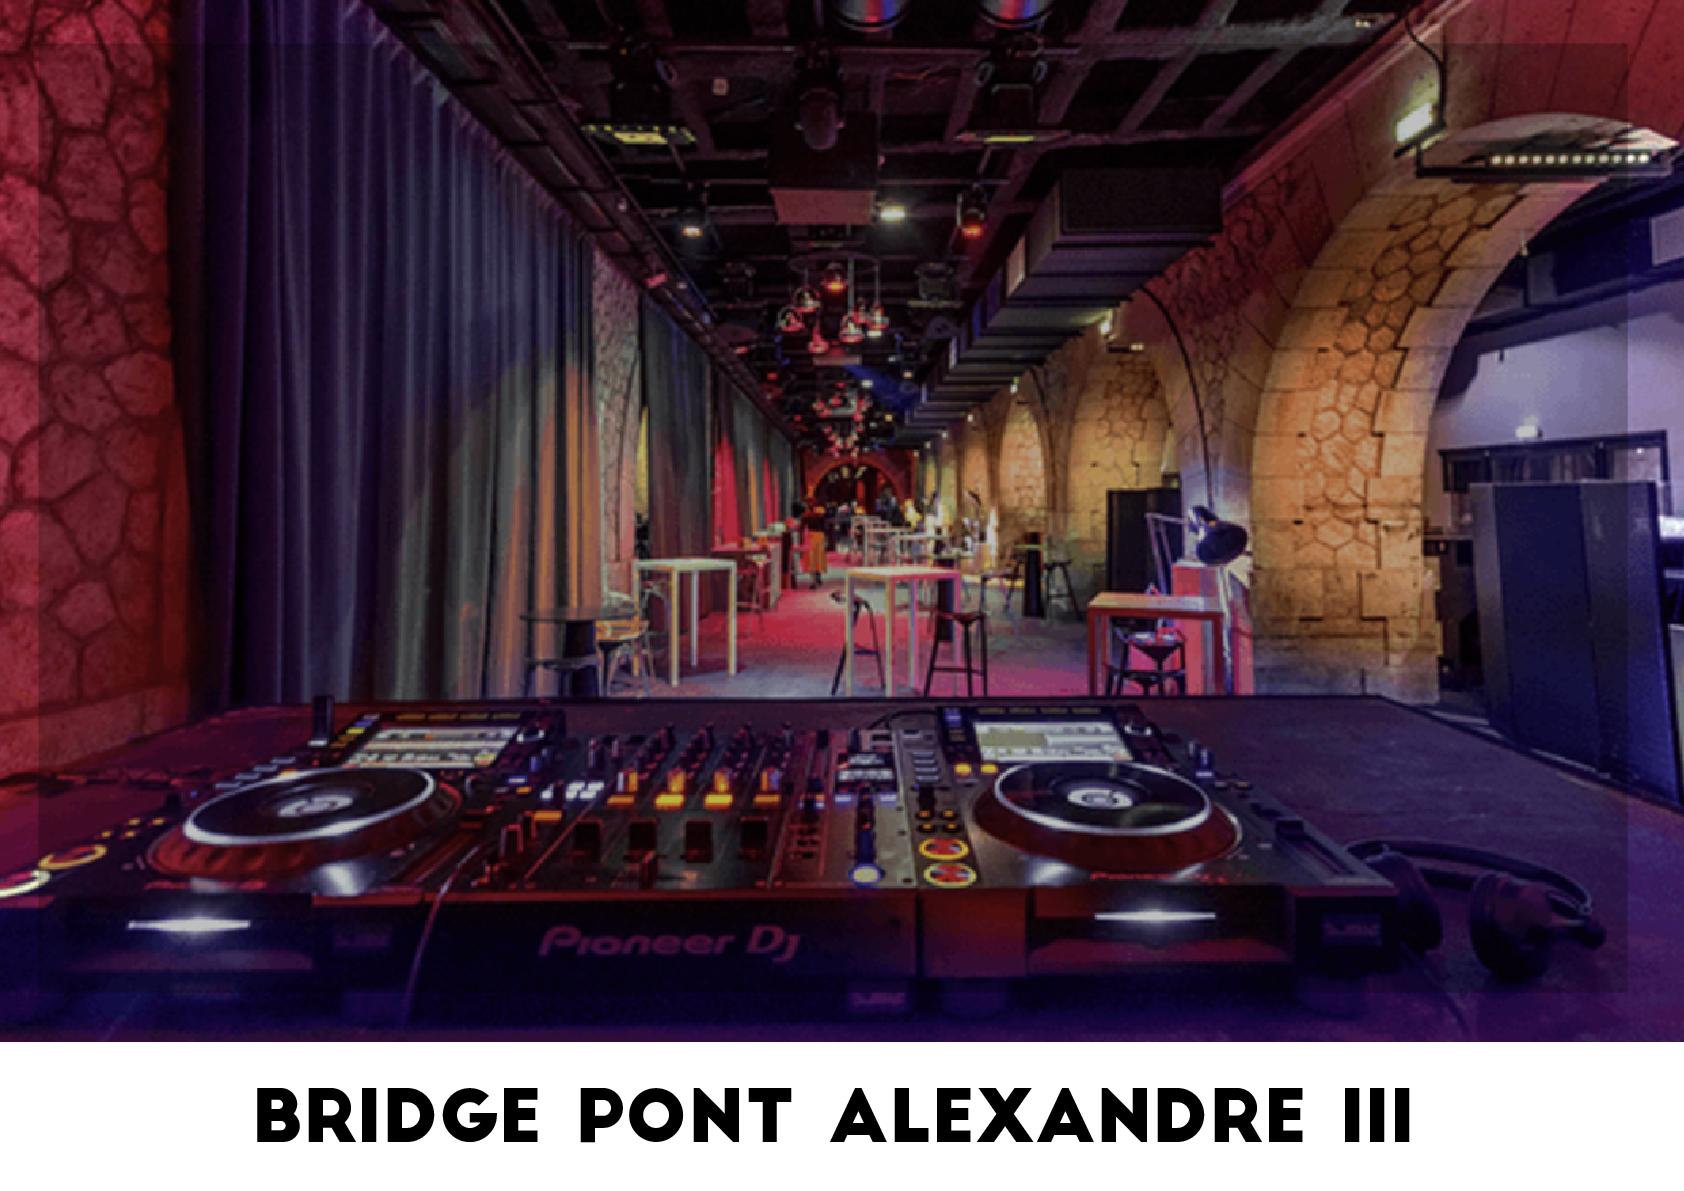 Bridge Pont Alexandre III